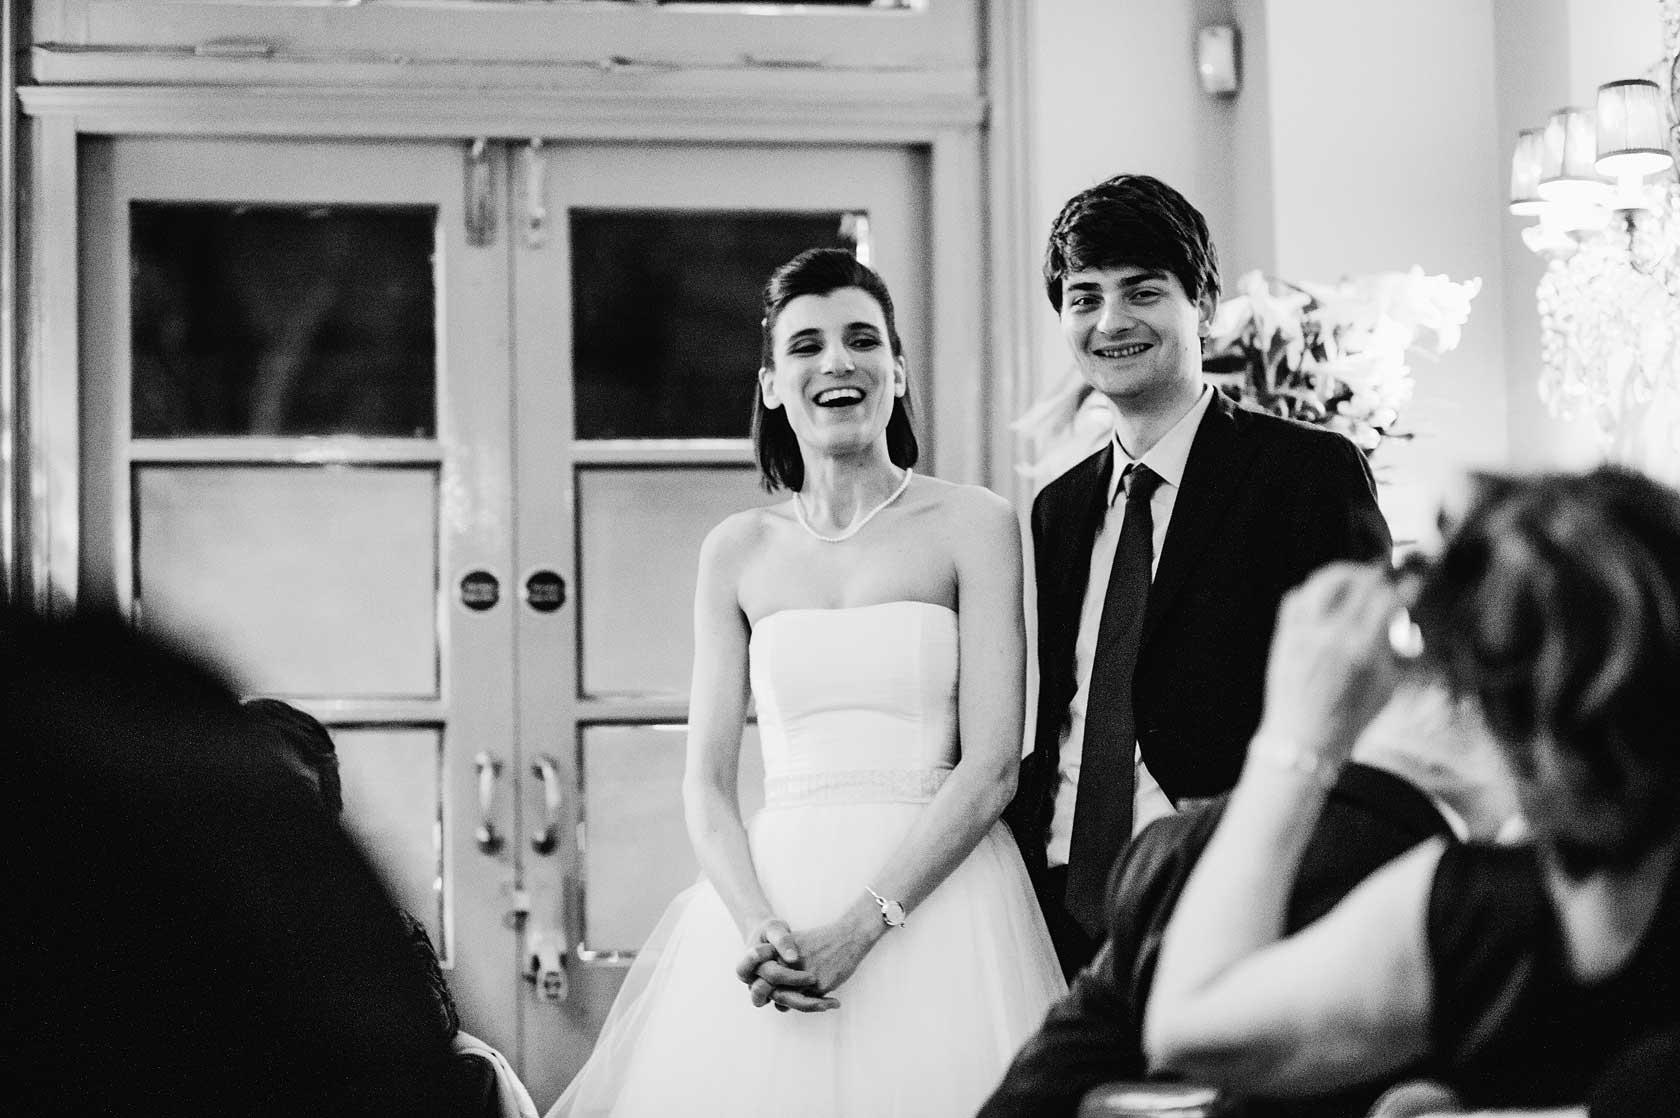 Reportage Wedding Photography at Cheyne Walk Brasserie